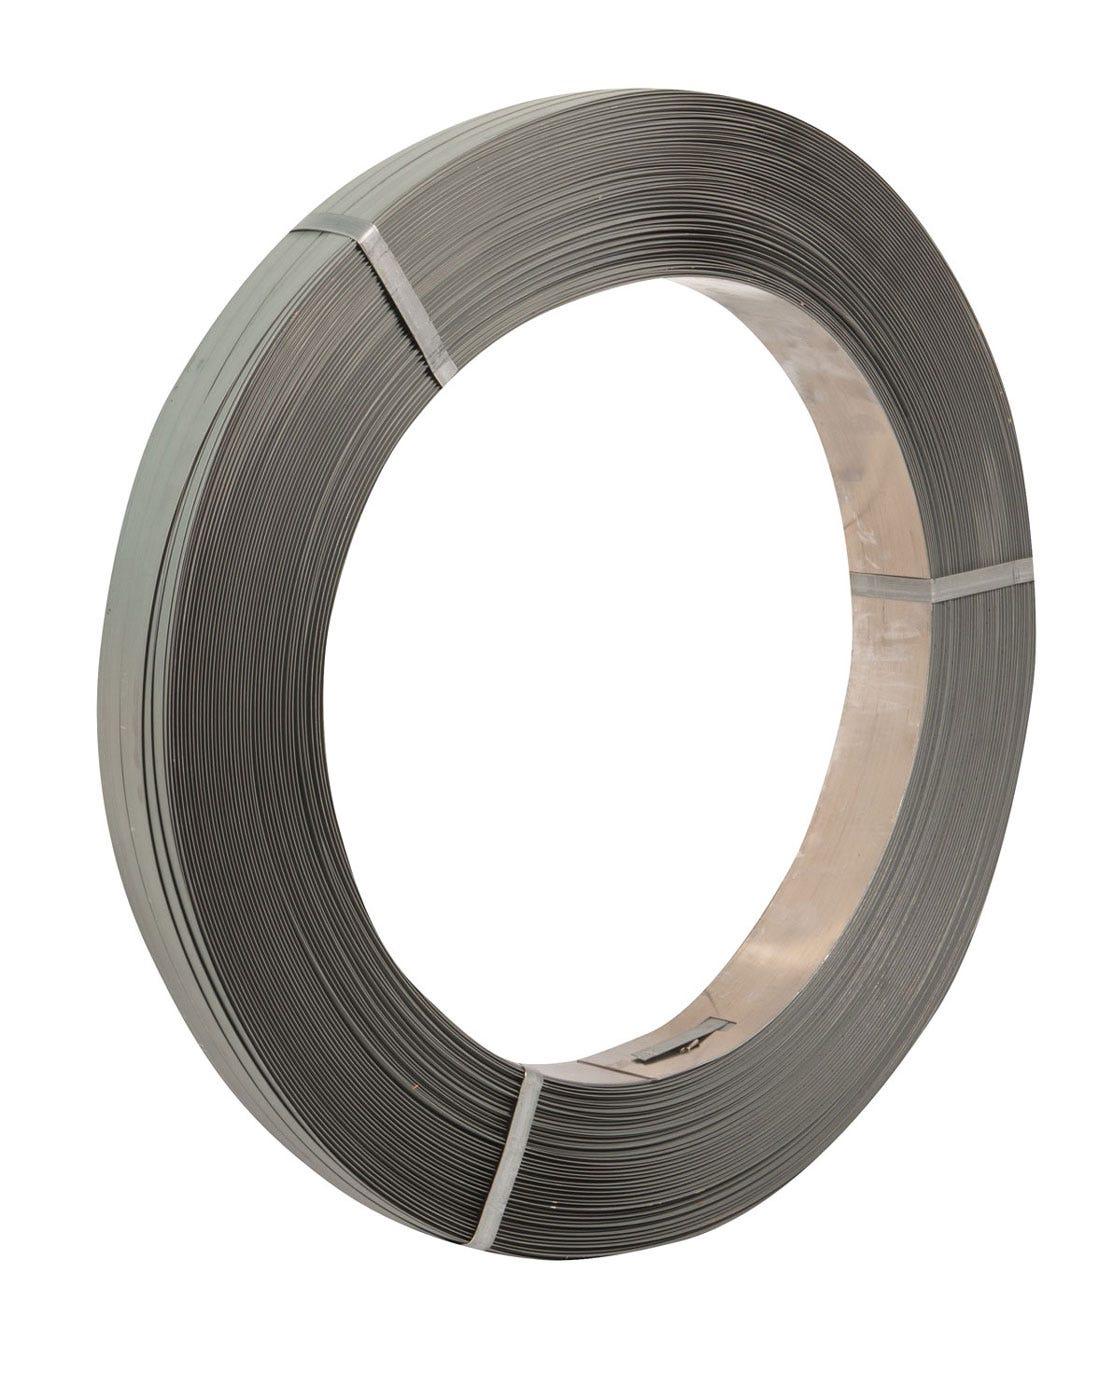 Safeguard® Zinc 19mm Ribbon Wound Strap